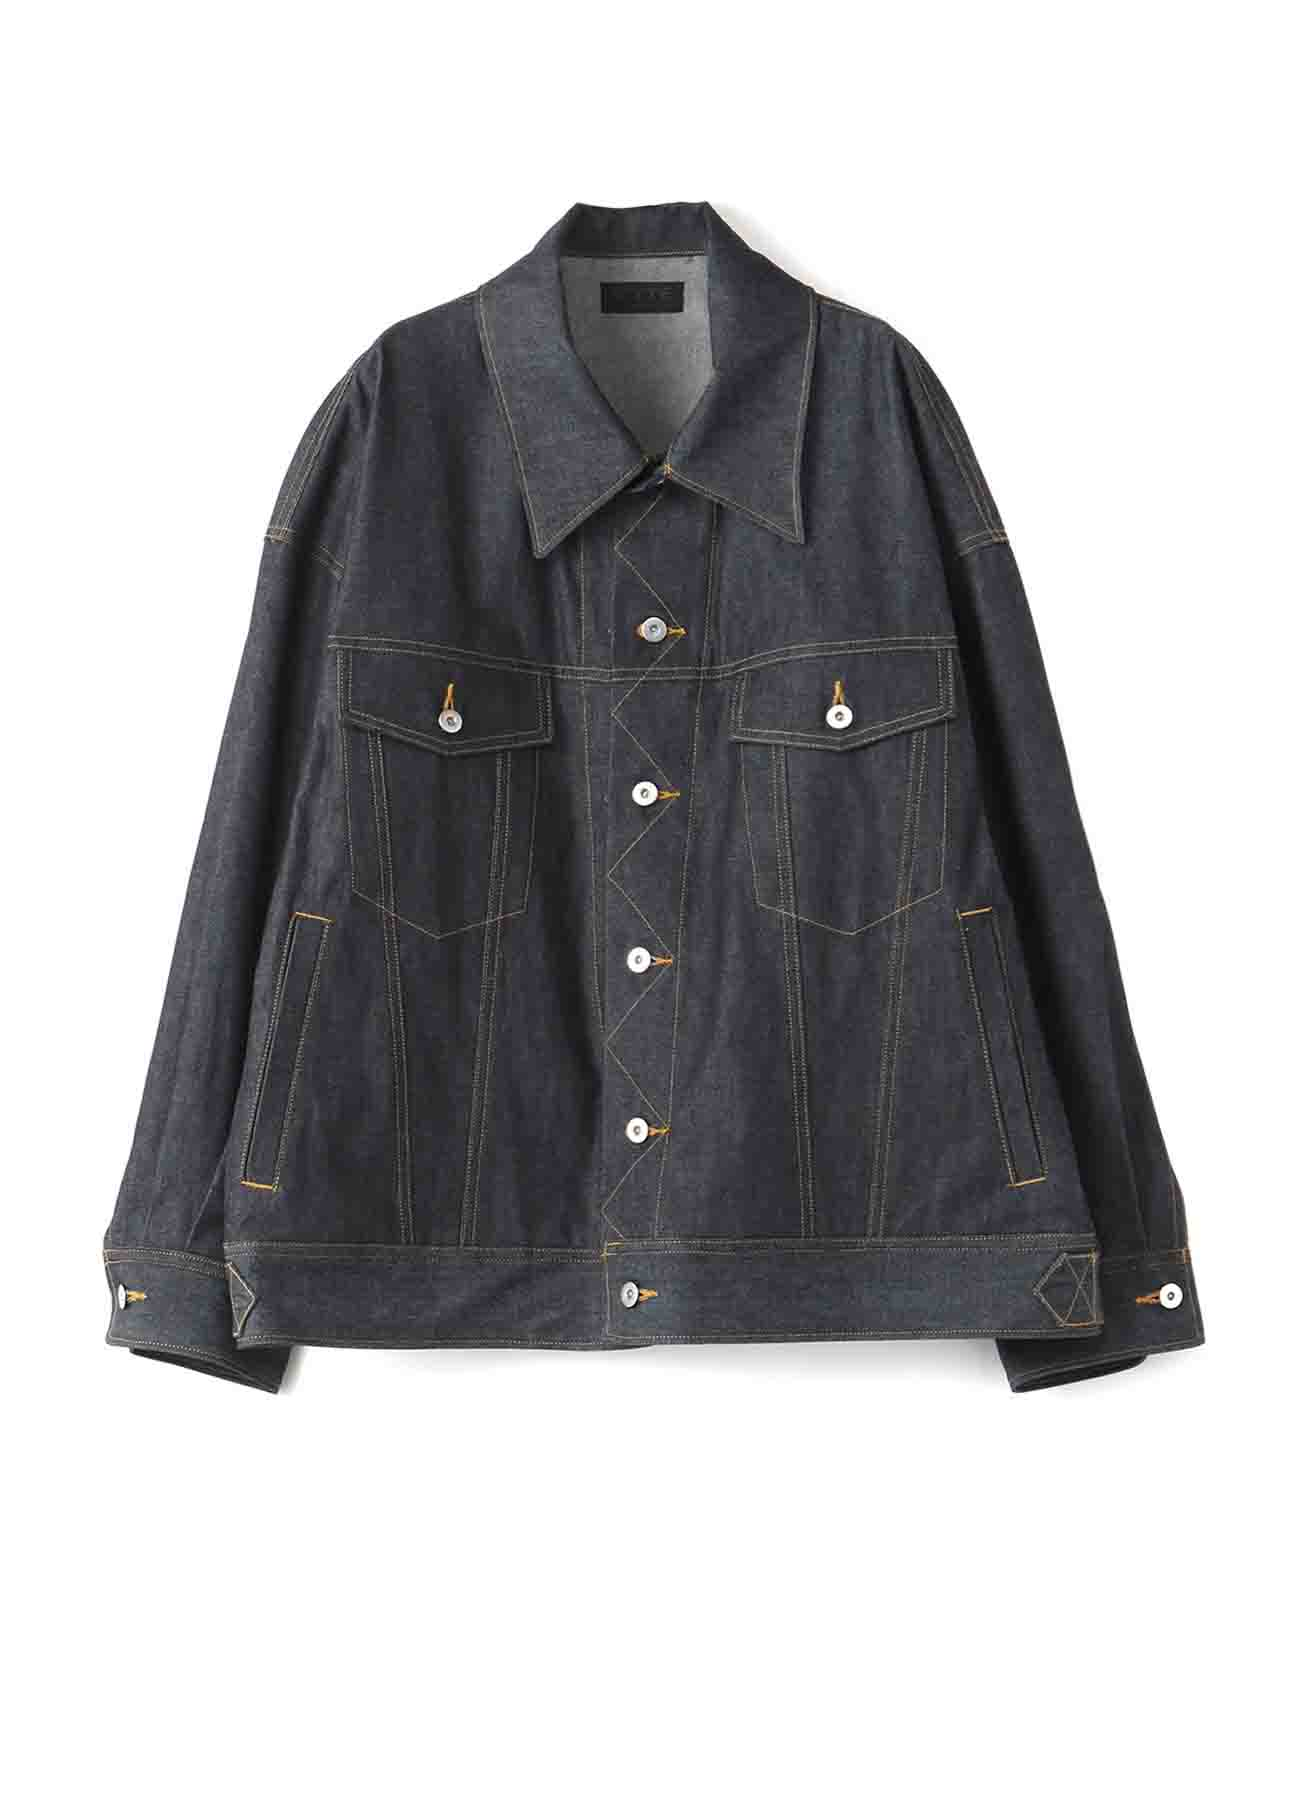 10 oz Big Denim Jacket